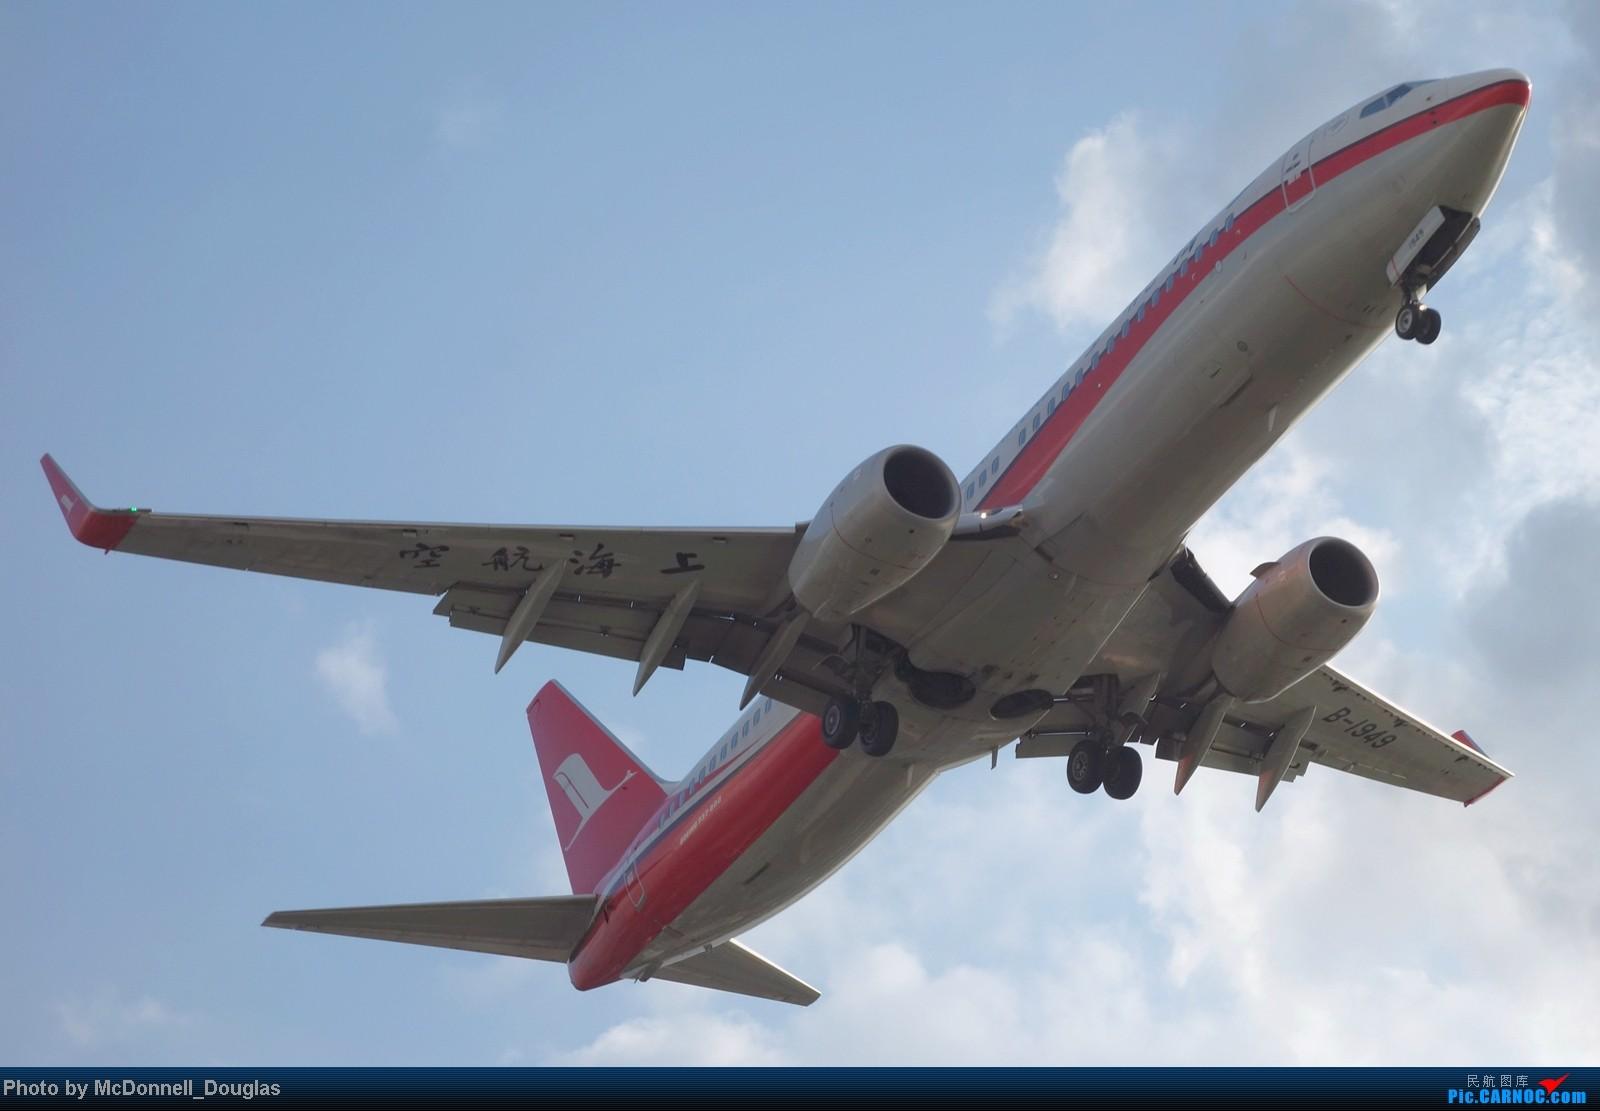 Re:[原创]【上海飞友会】ZSSS杂图一组 BOEING 737-800 B-1949 中国上海虹桥机场